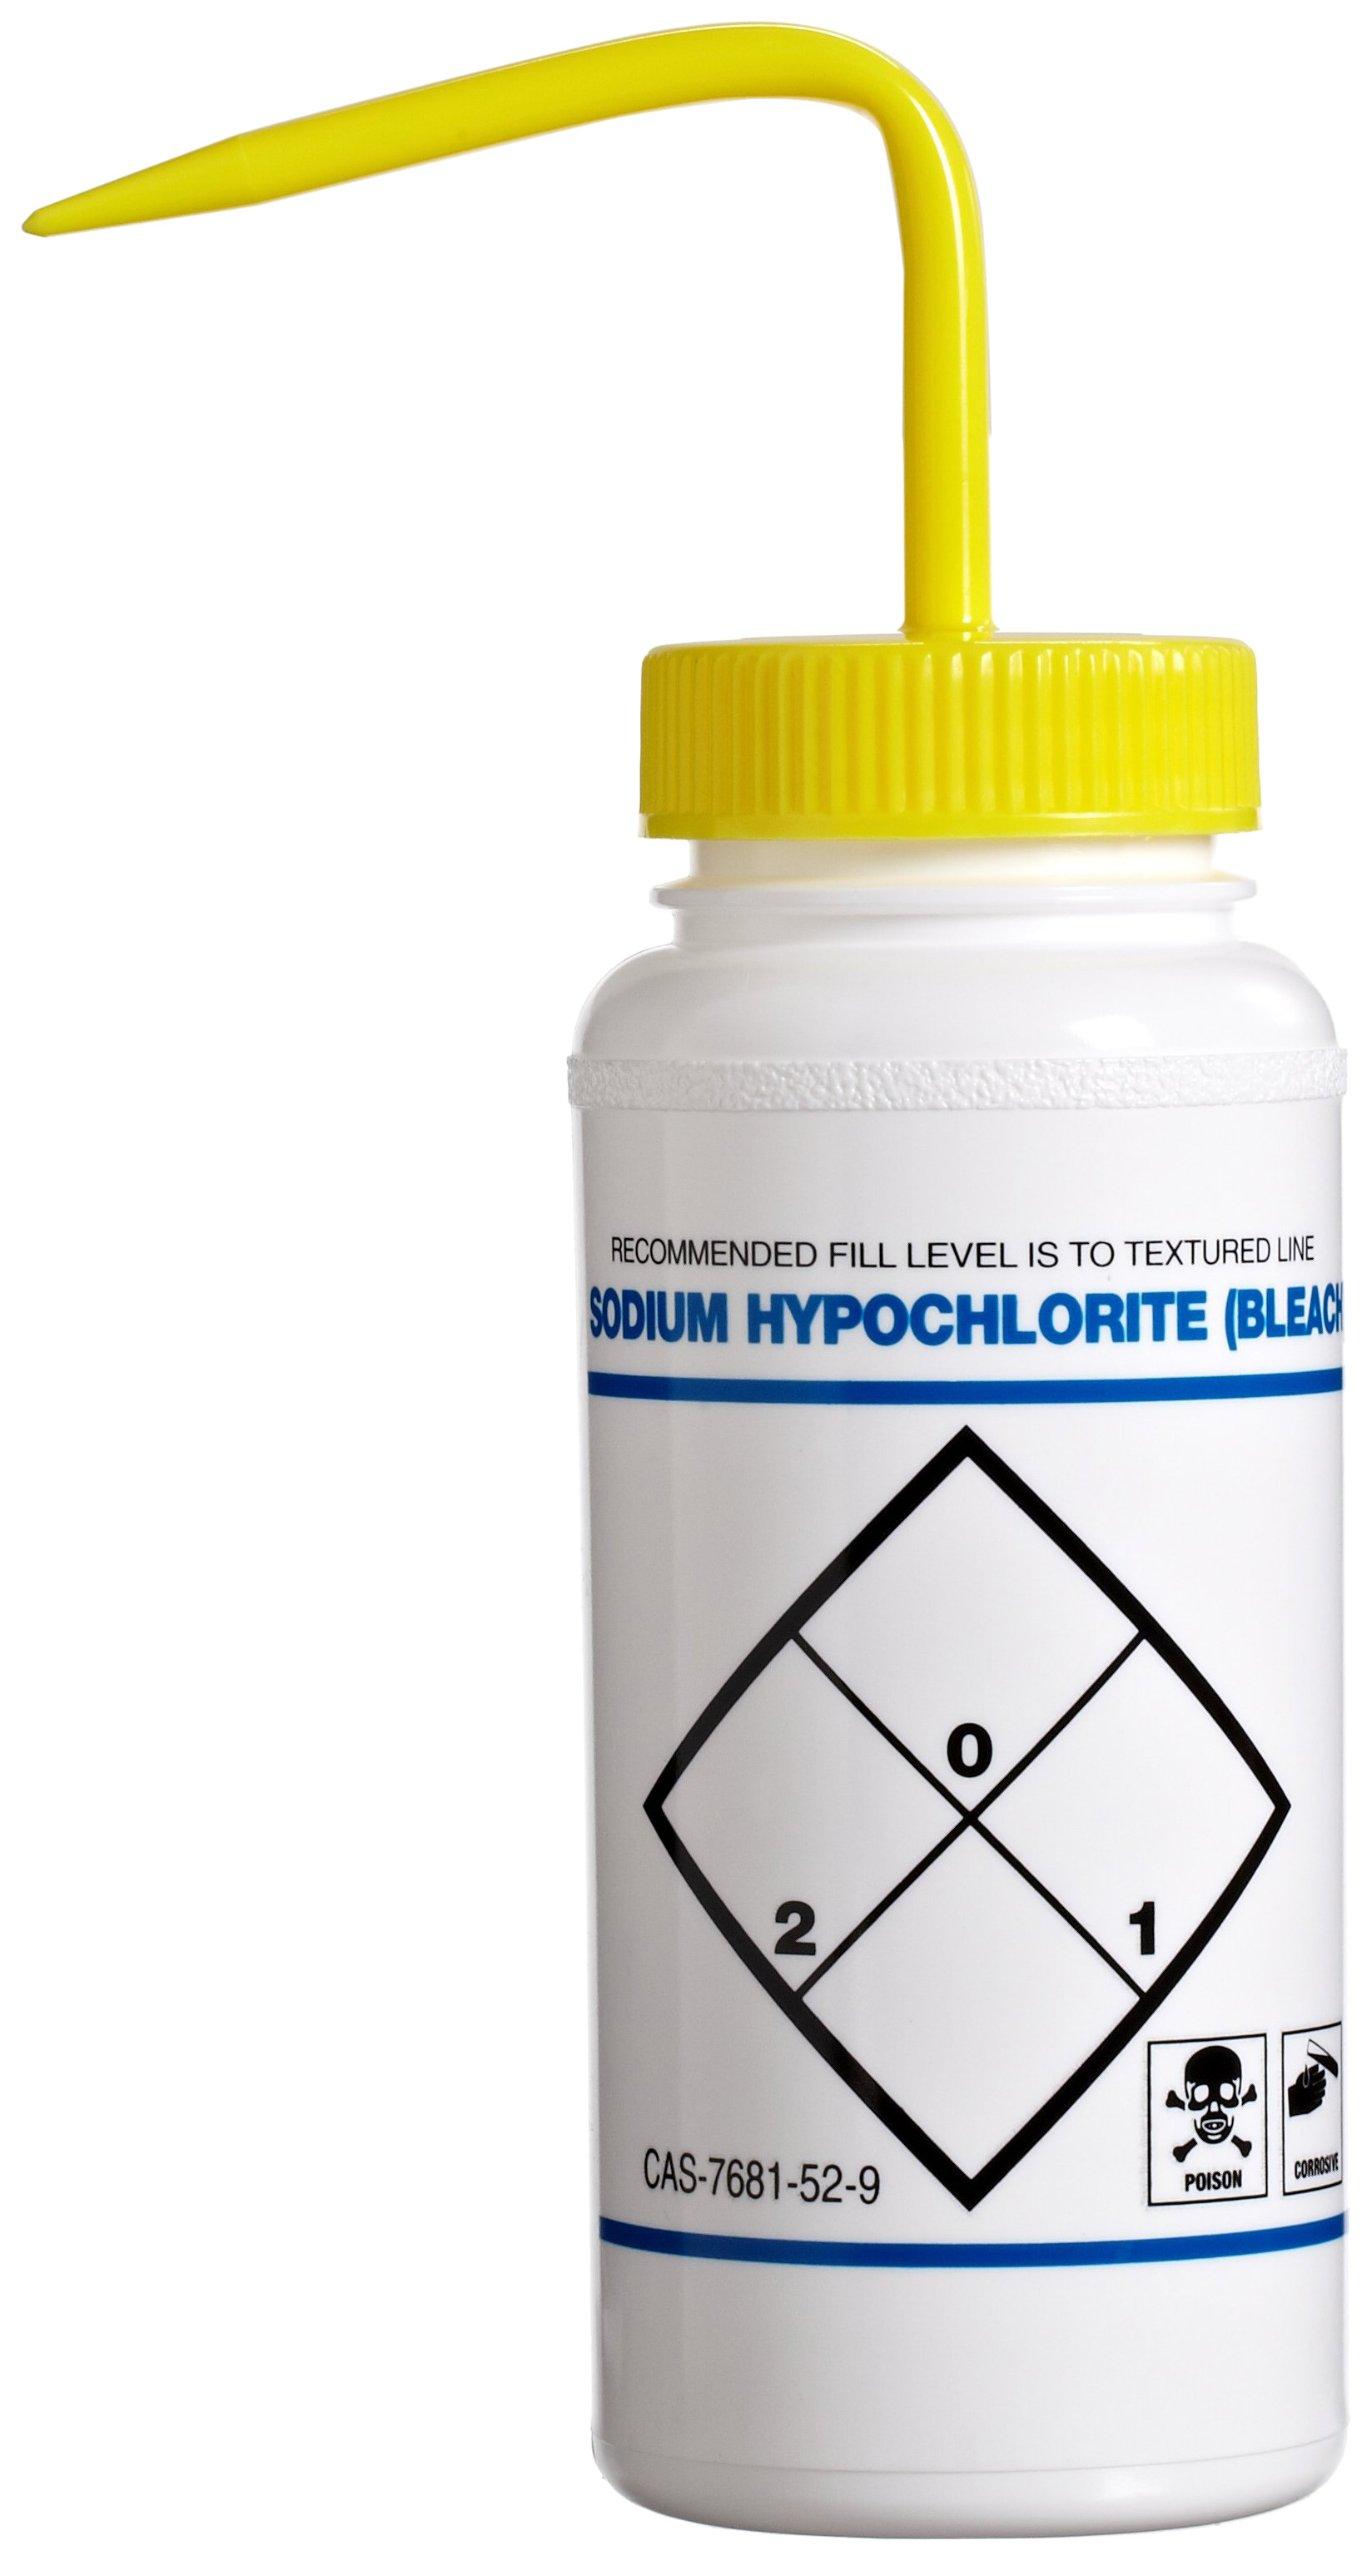 Bel-Art Safety-Labeled 2-Color Sodium Hypochlorite (Bleach) Wide-Mouth Wash Bottles; 500ml (16oz), Polyethylene w/Yellow Polypropylene Cap (Pack of 6) (F11646-0627)